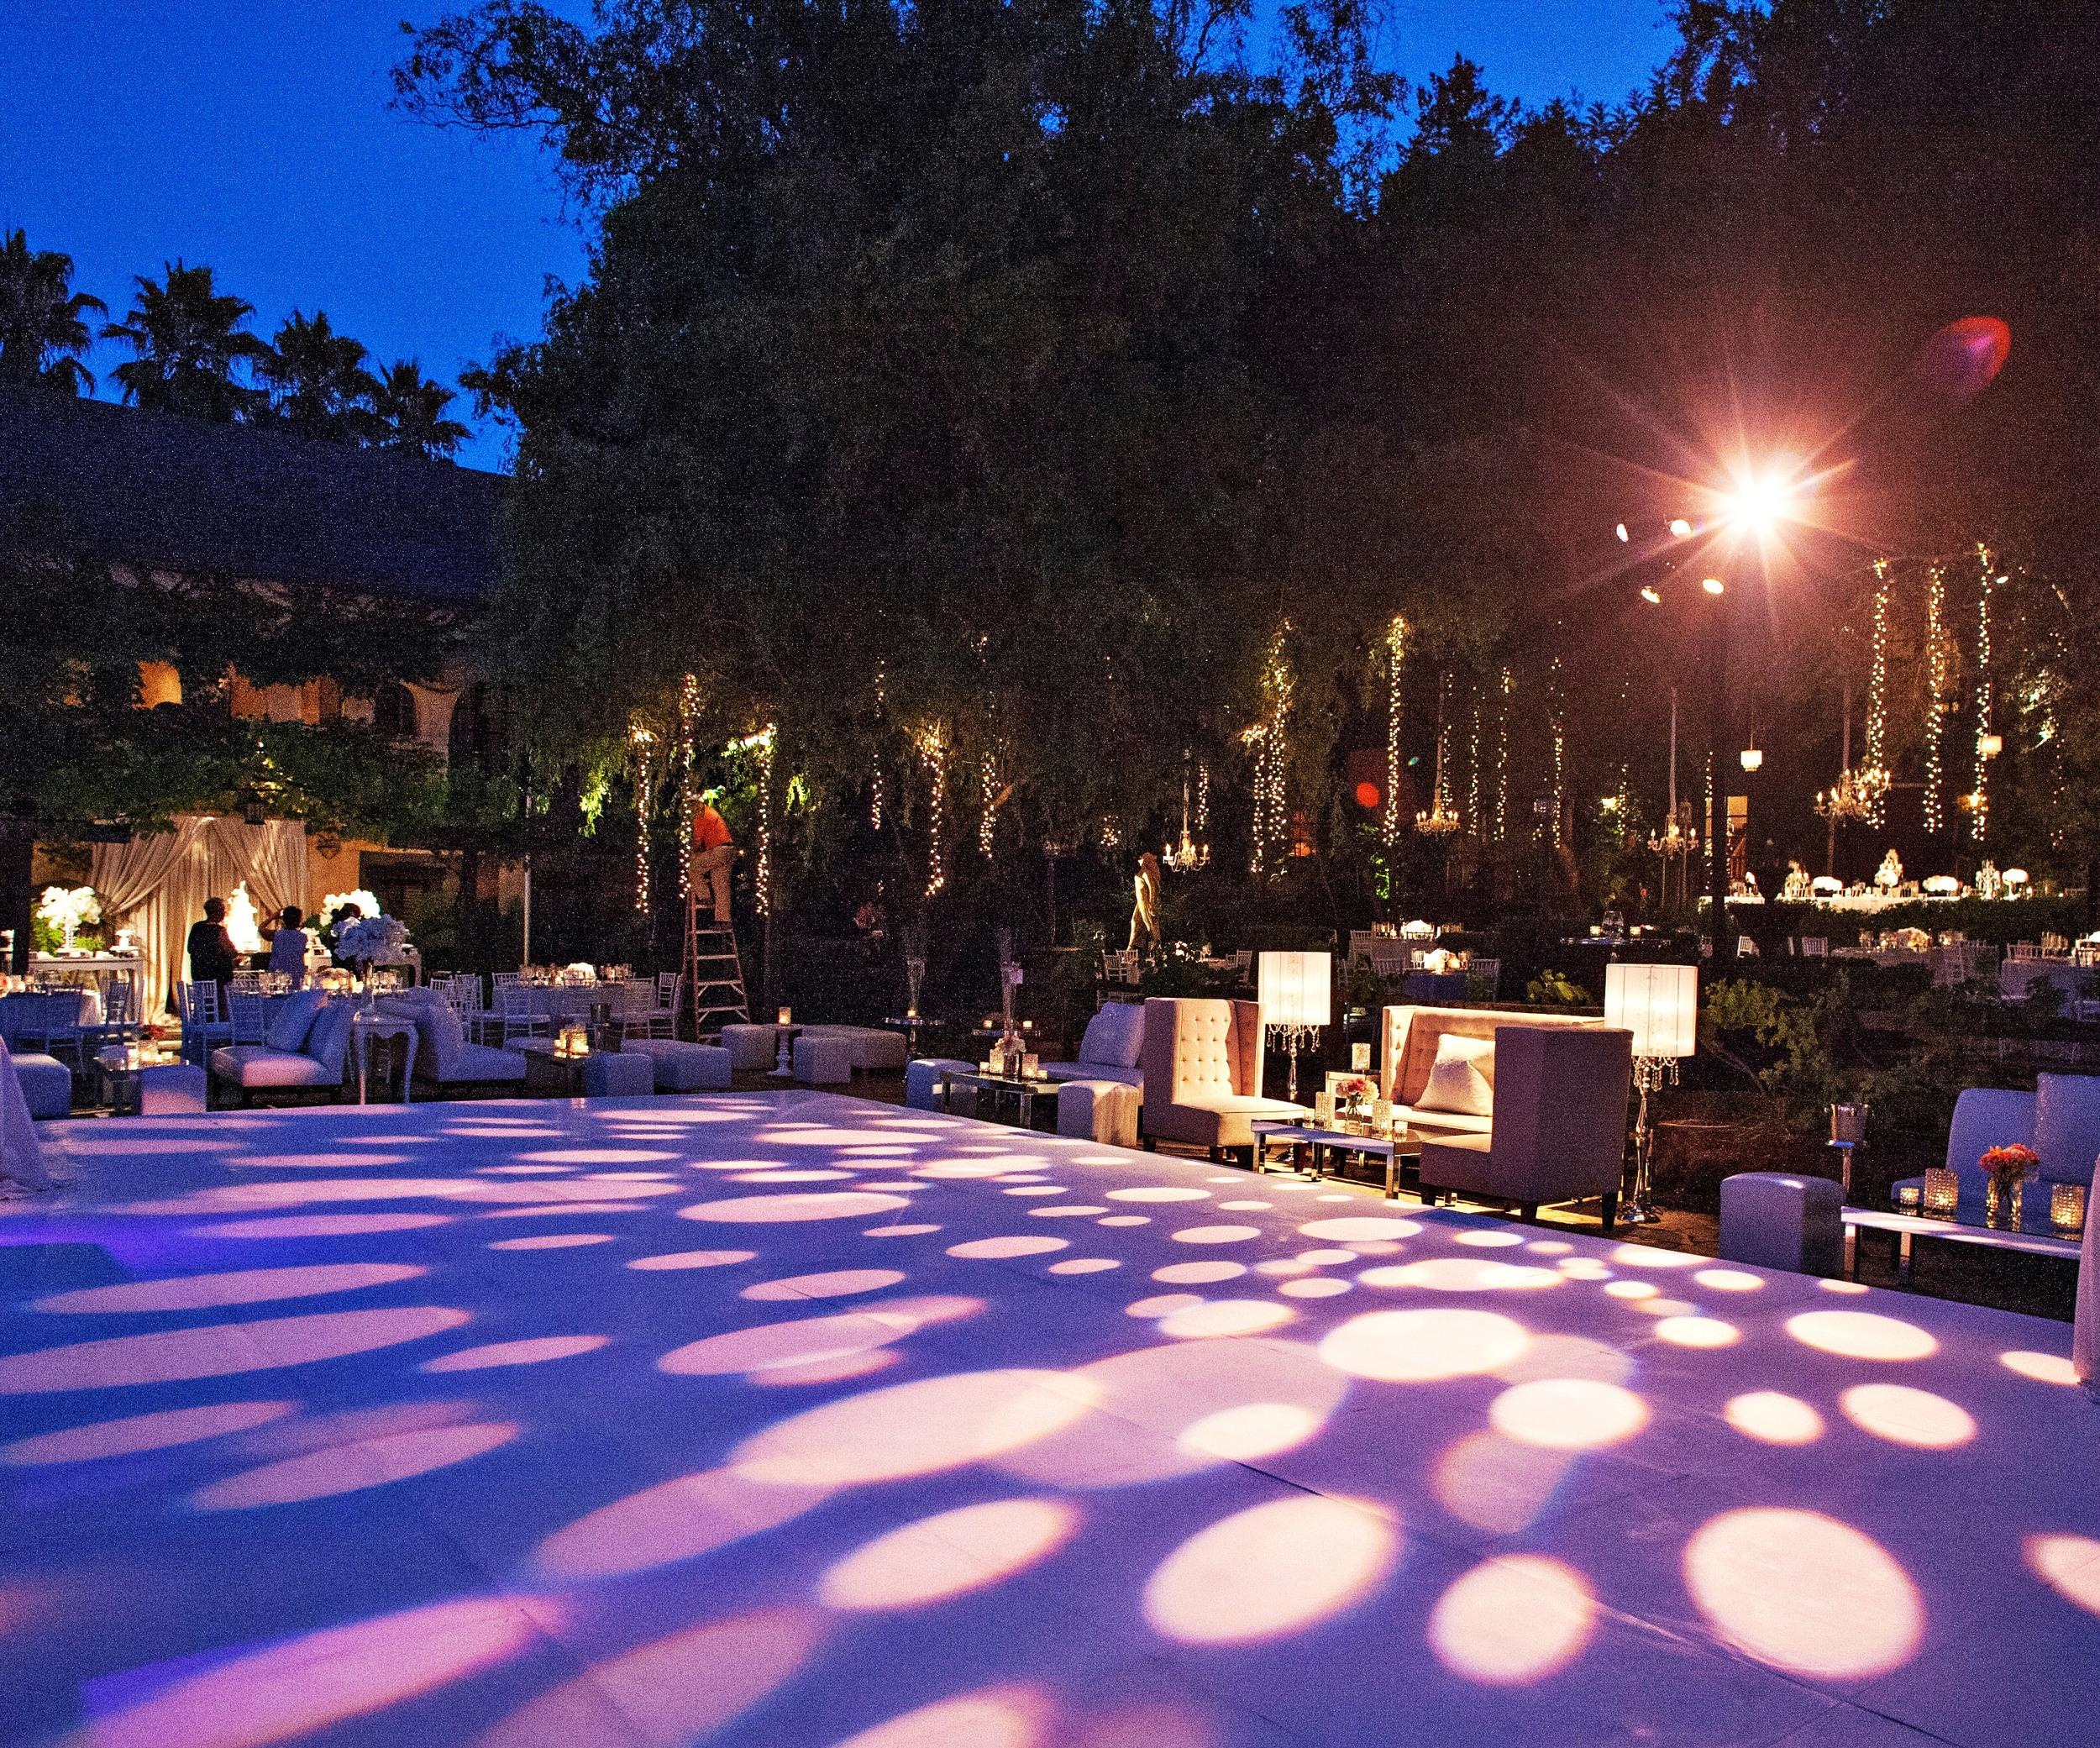 29. dance floor over pool, hanging fairly lights, summer wedding, wedding lighting, dance floor patterns, modern wedding lounges.jpg